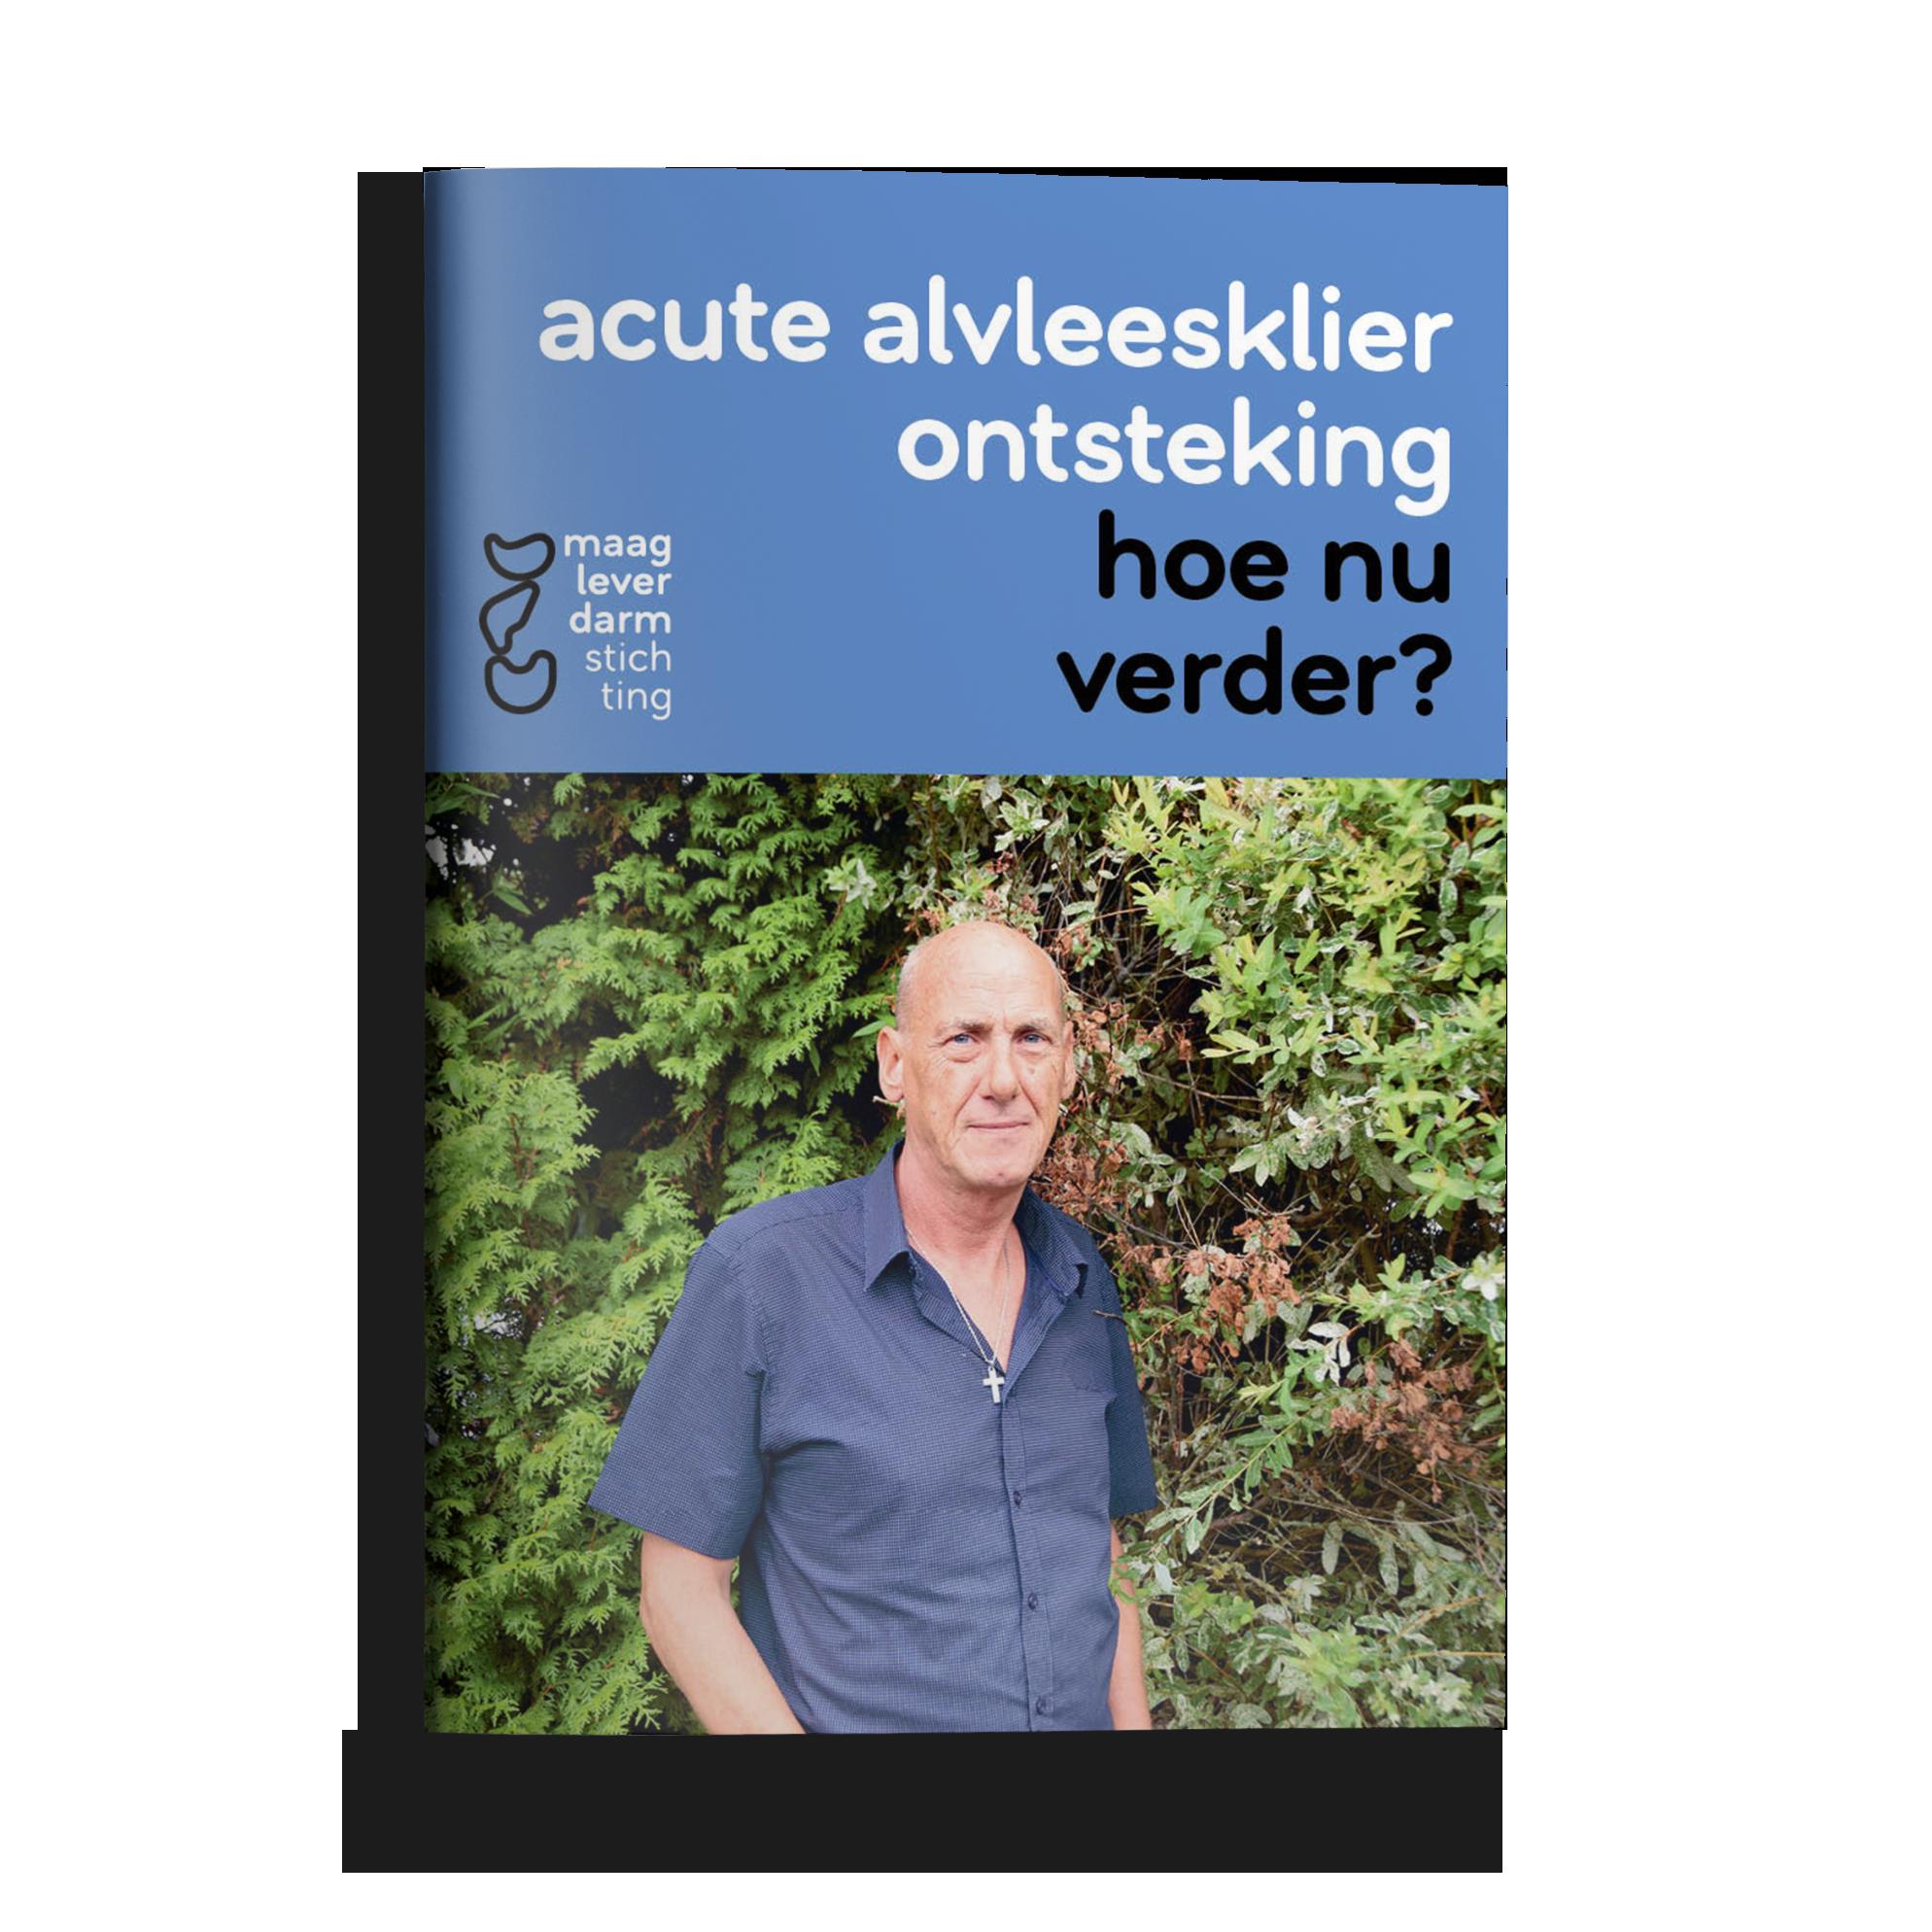 https://www.mlds.nl/content/uploads/MLDS-Mockup-Acute-alvleesklierontsteking.png